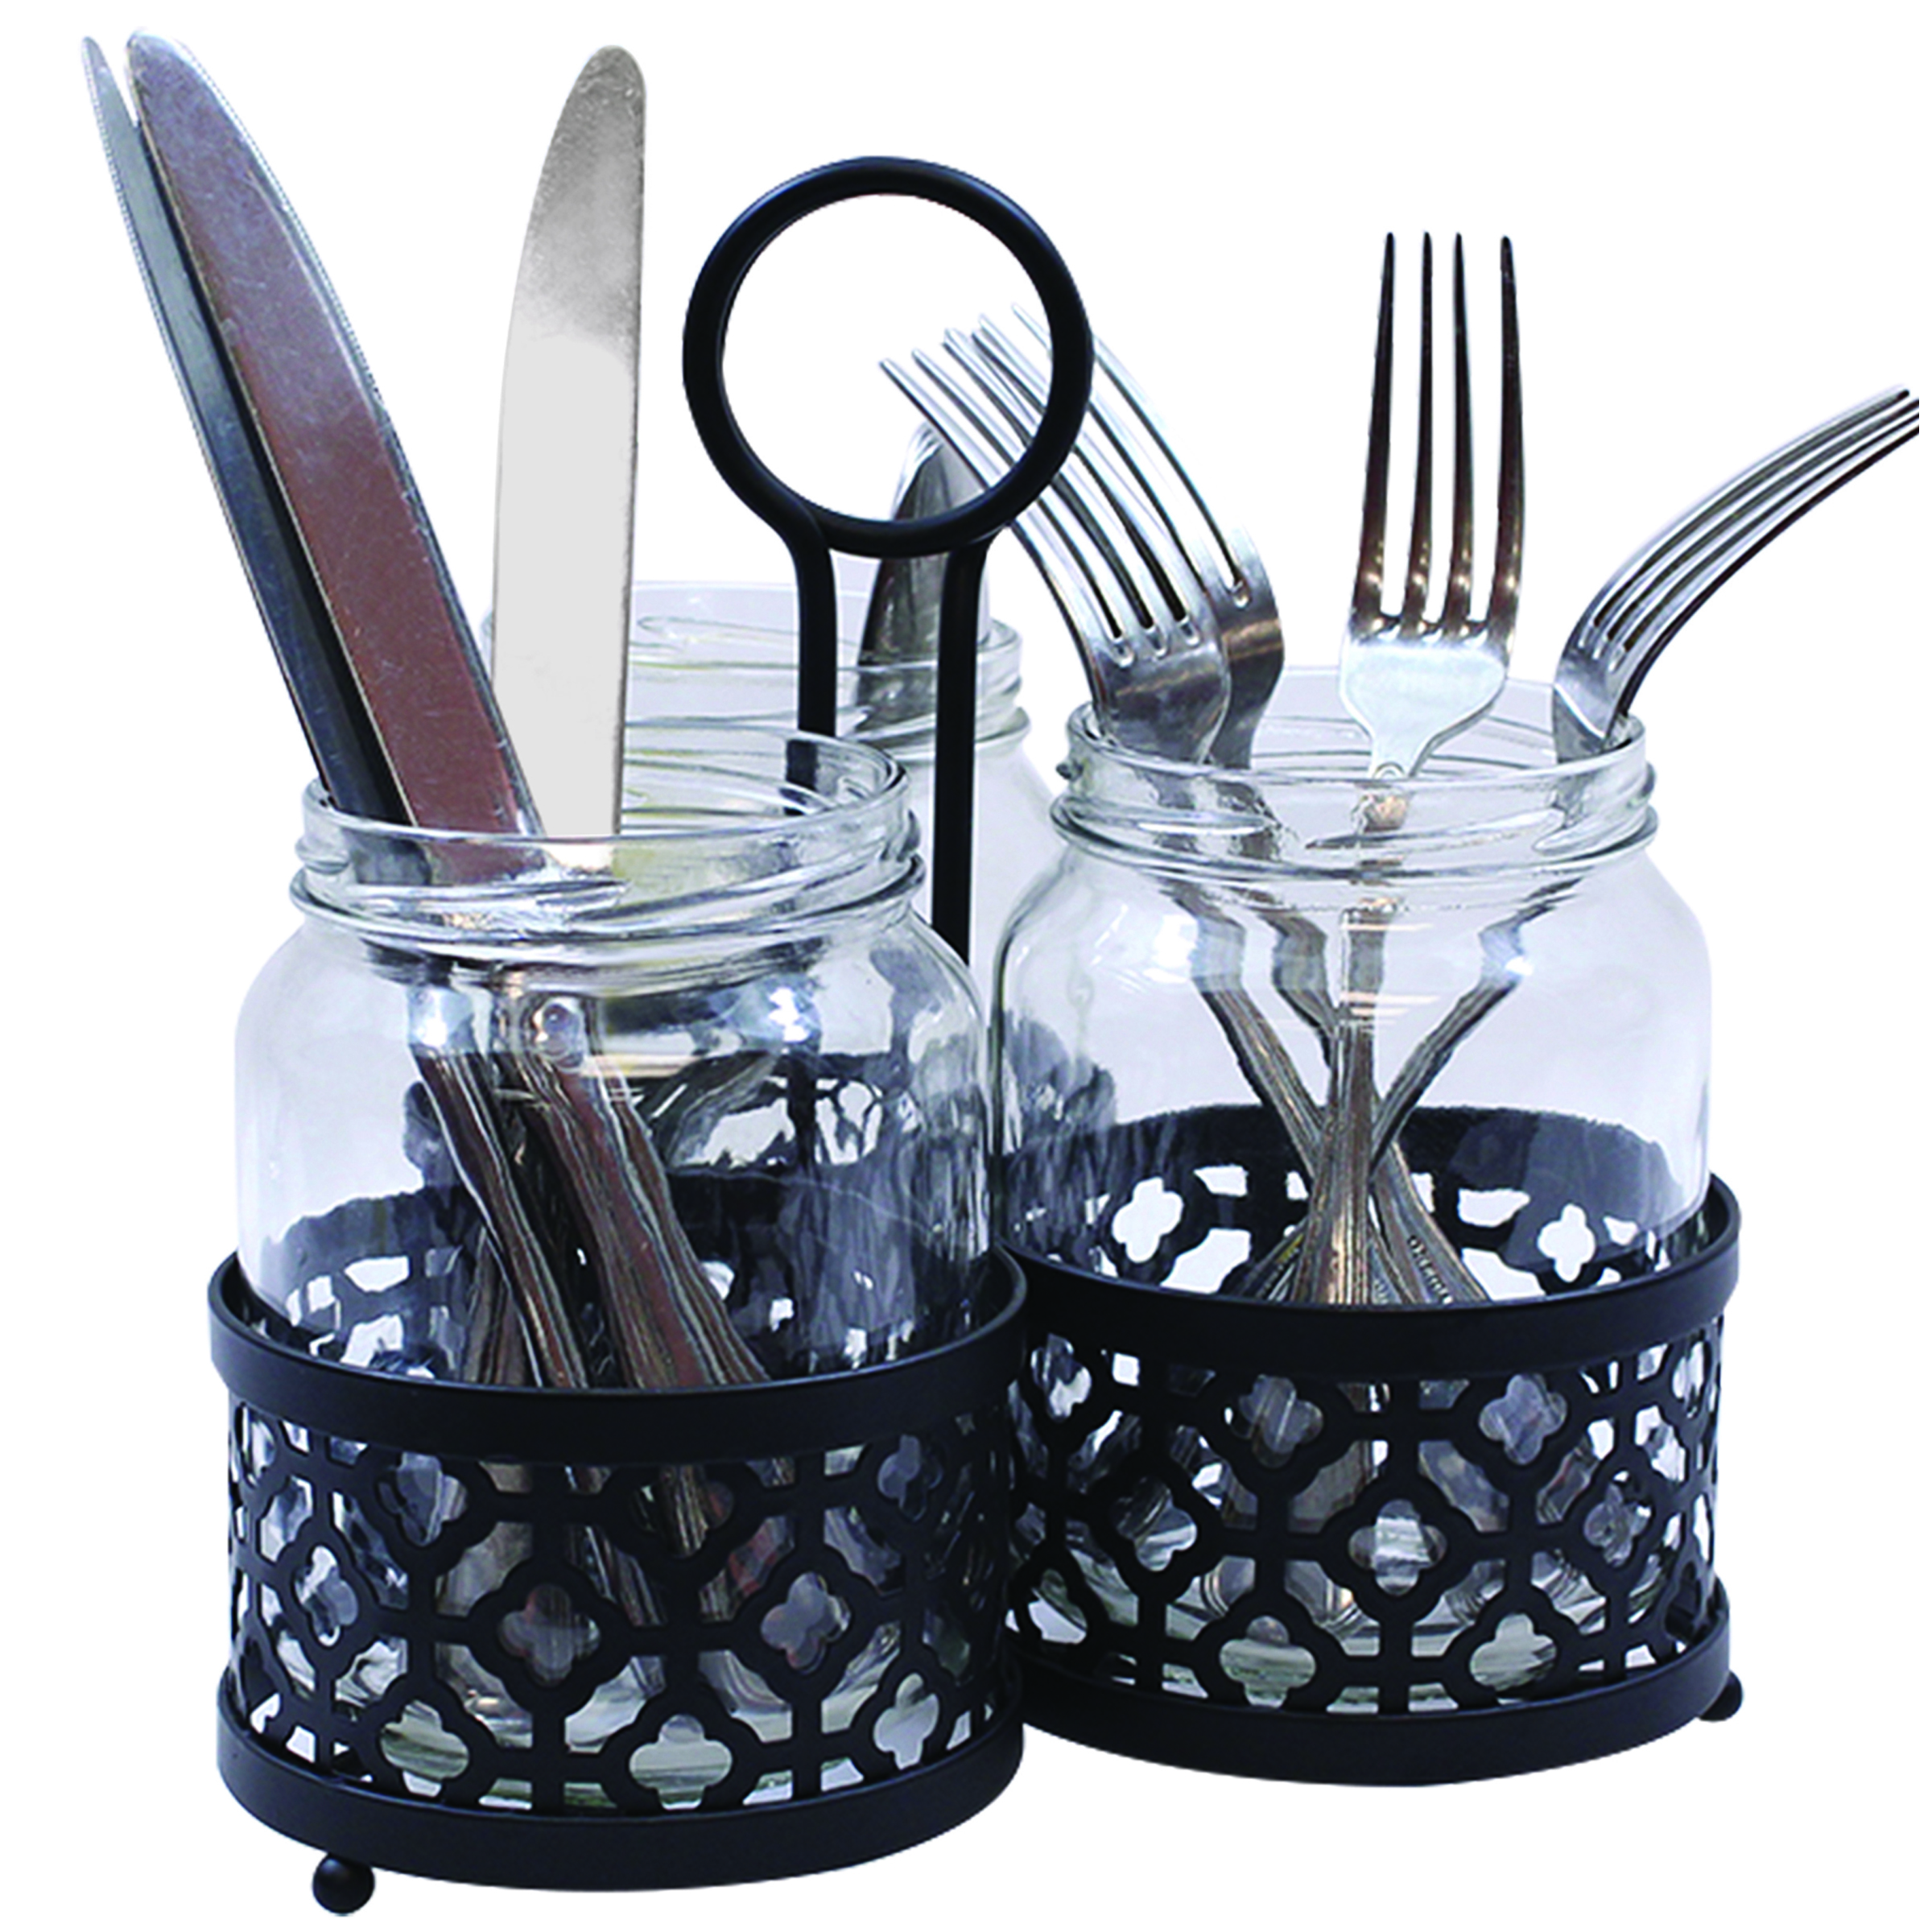 TableCraft Products MJRM3 food prep tools & gadgets